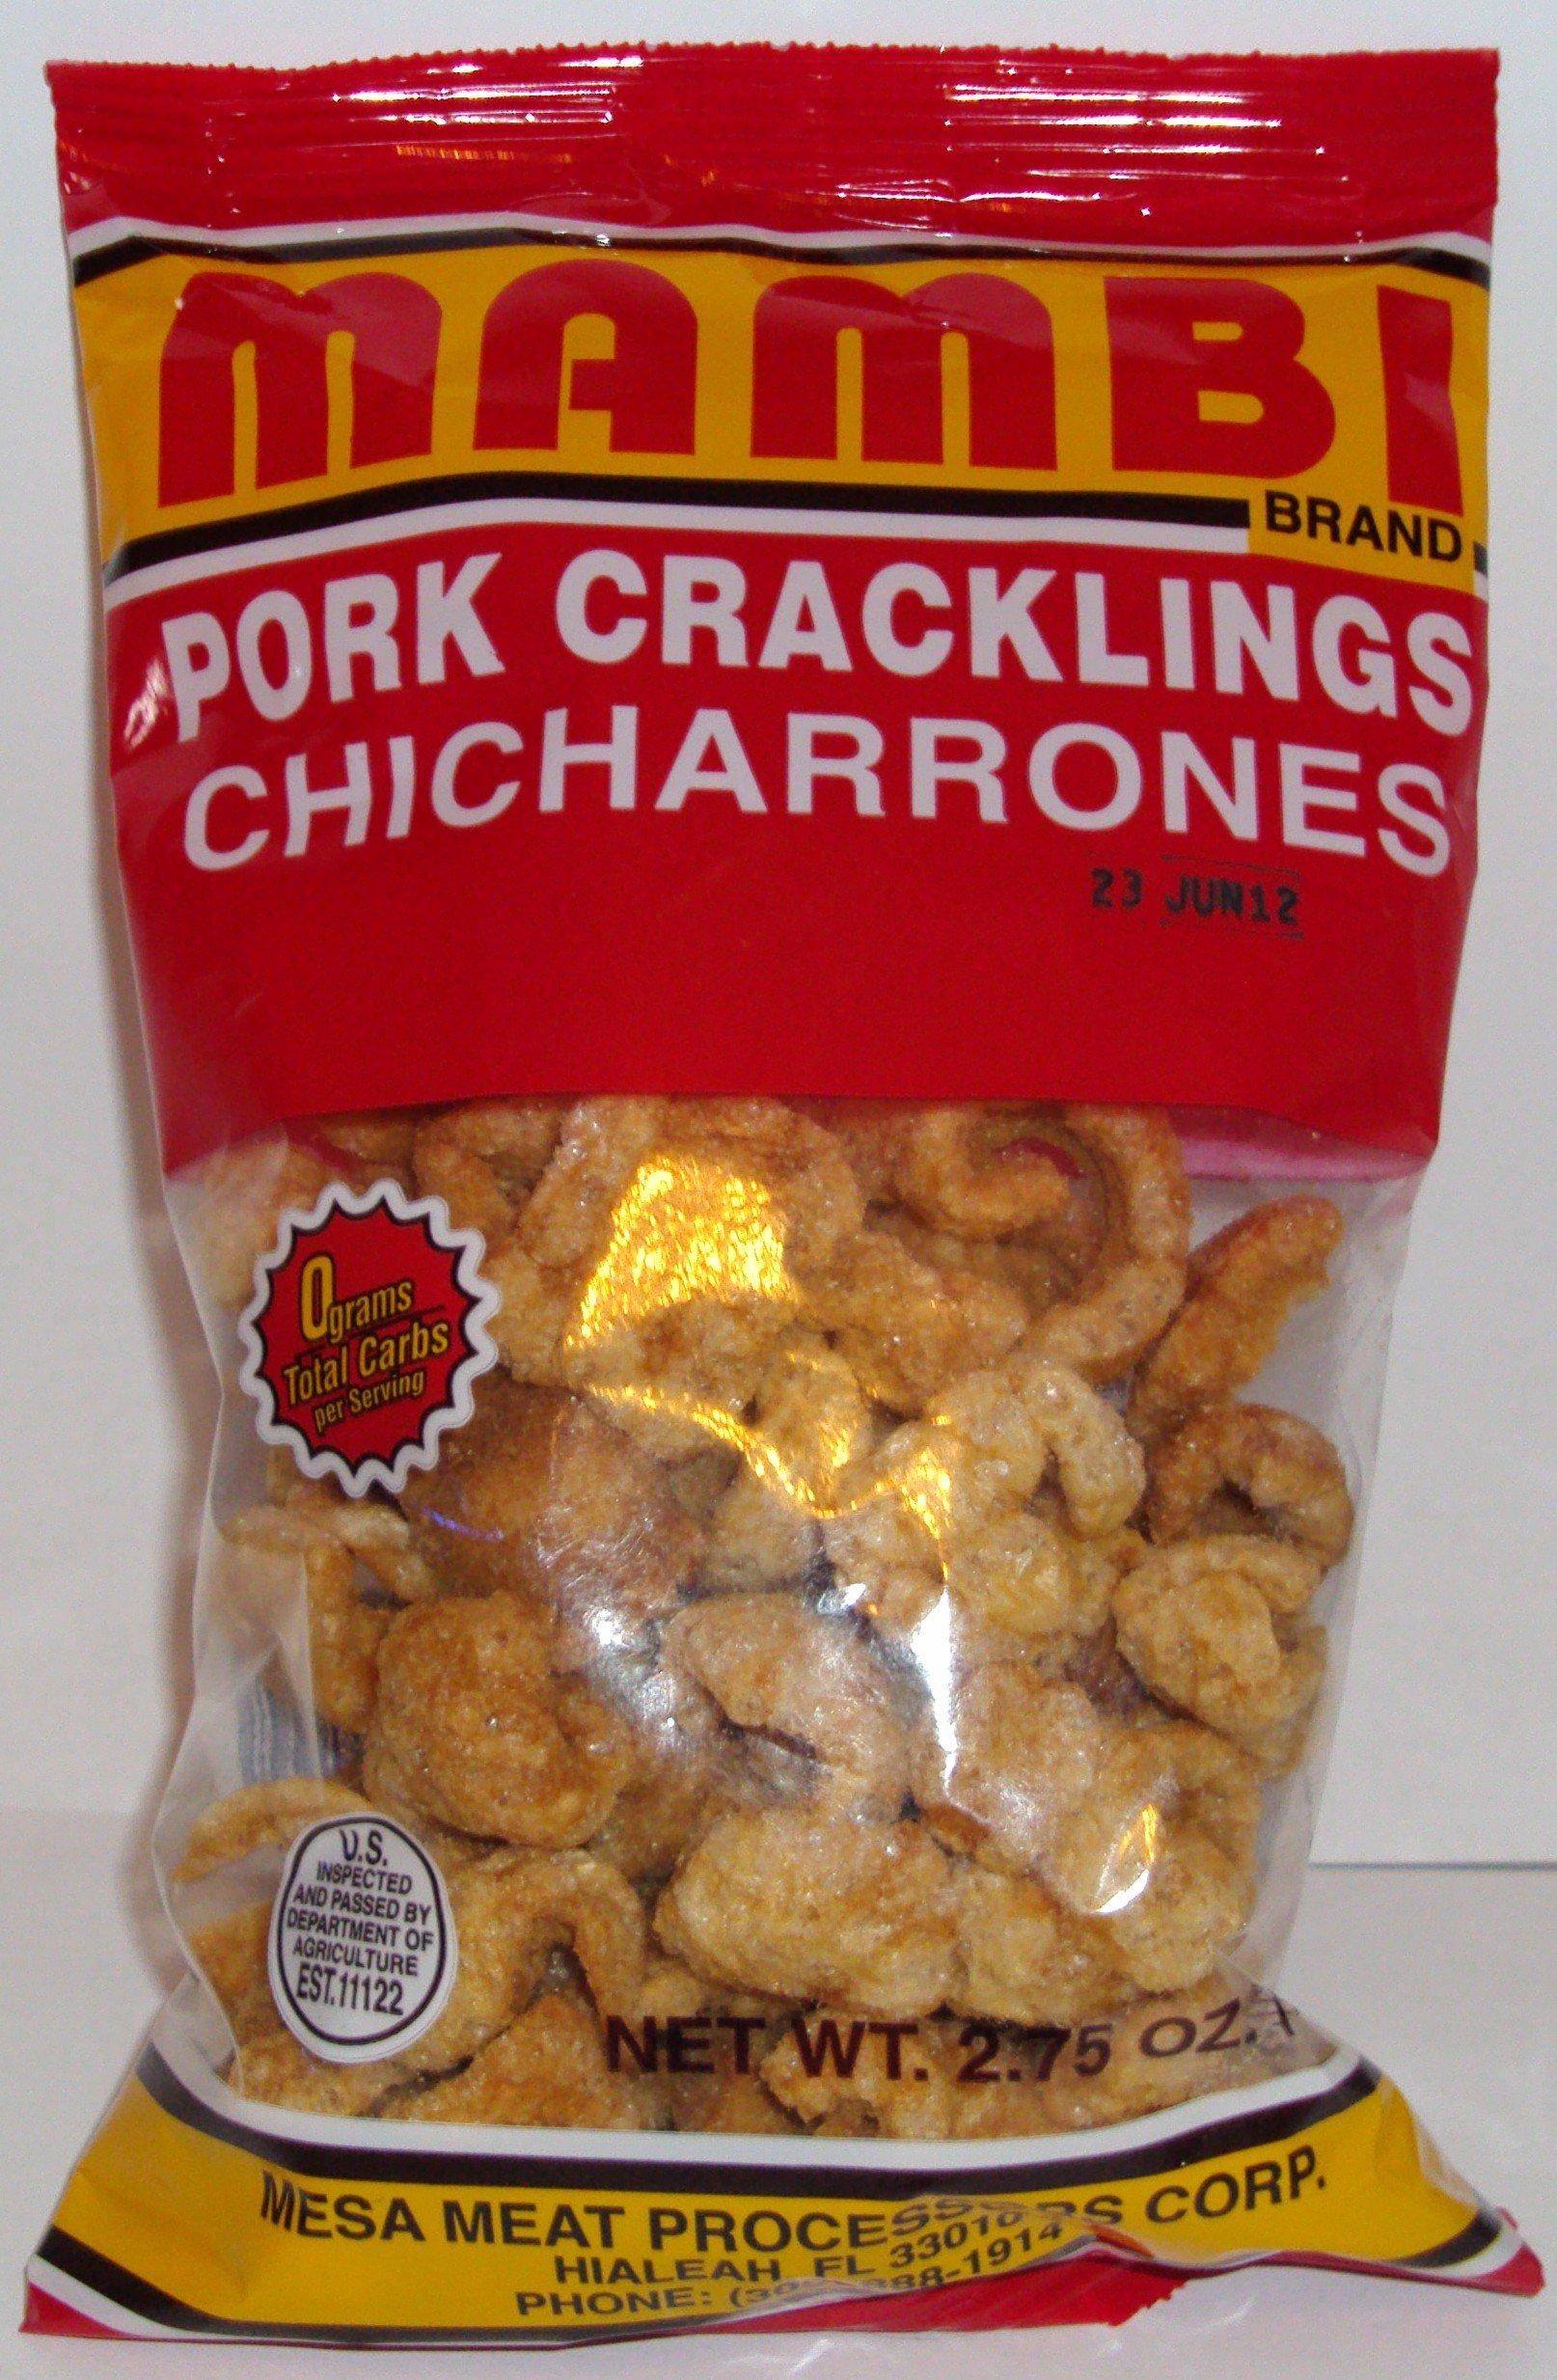 Pork Cracklings - Chicharrones Mambi 2.75 Oz Bag (Pack of 3)